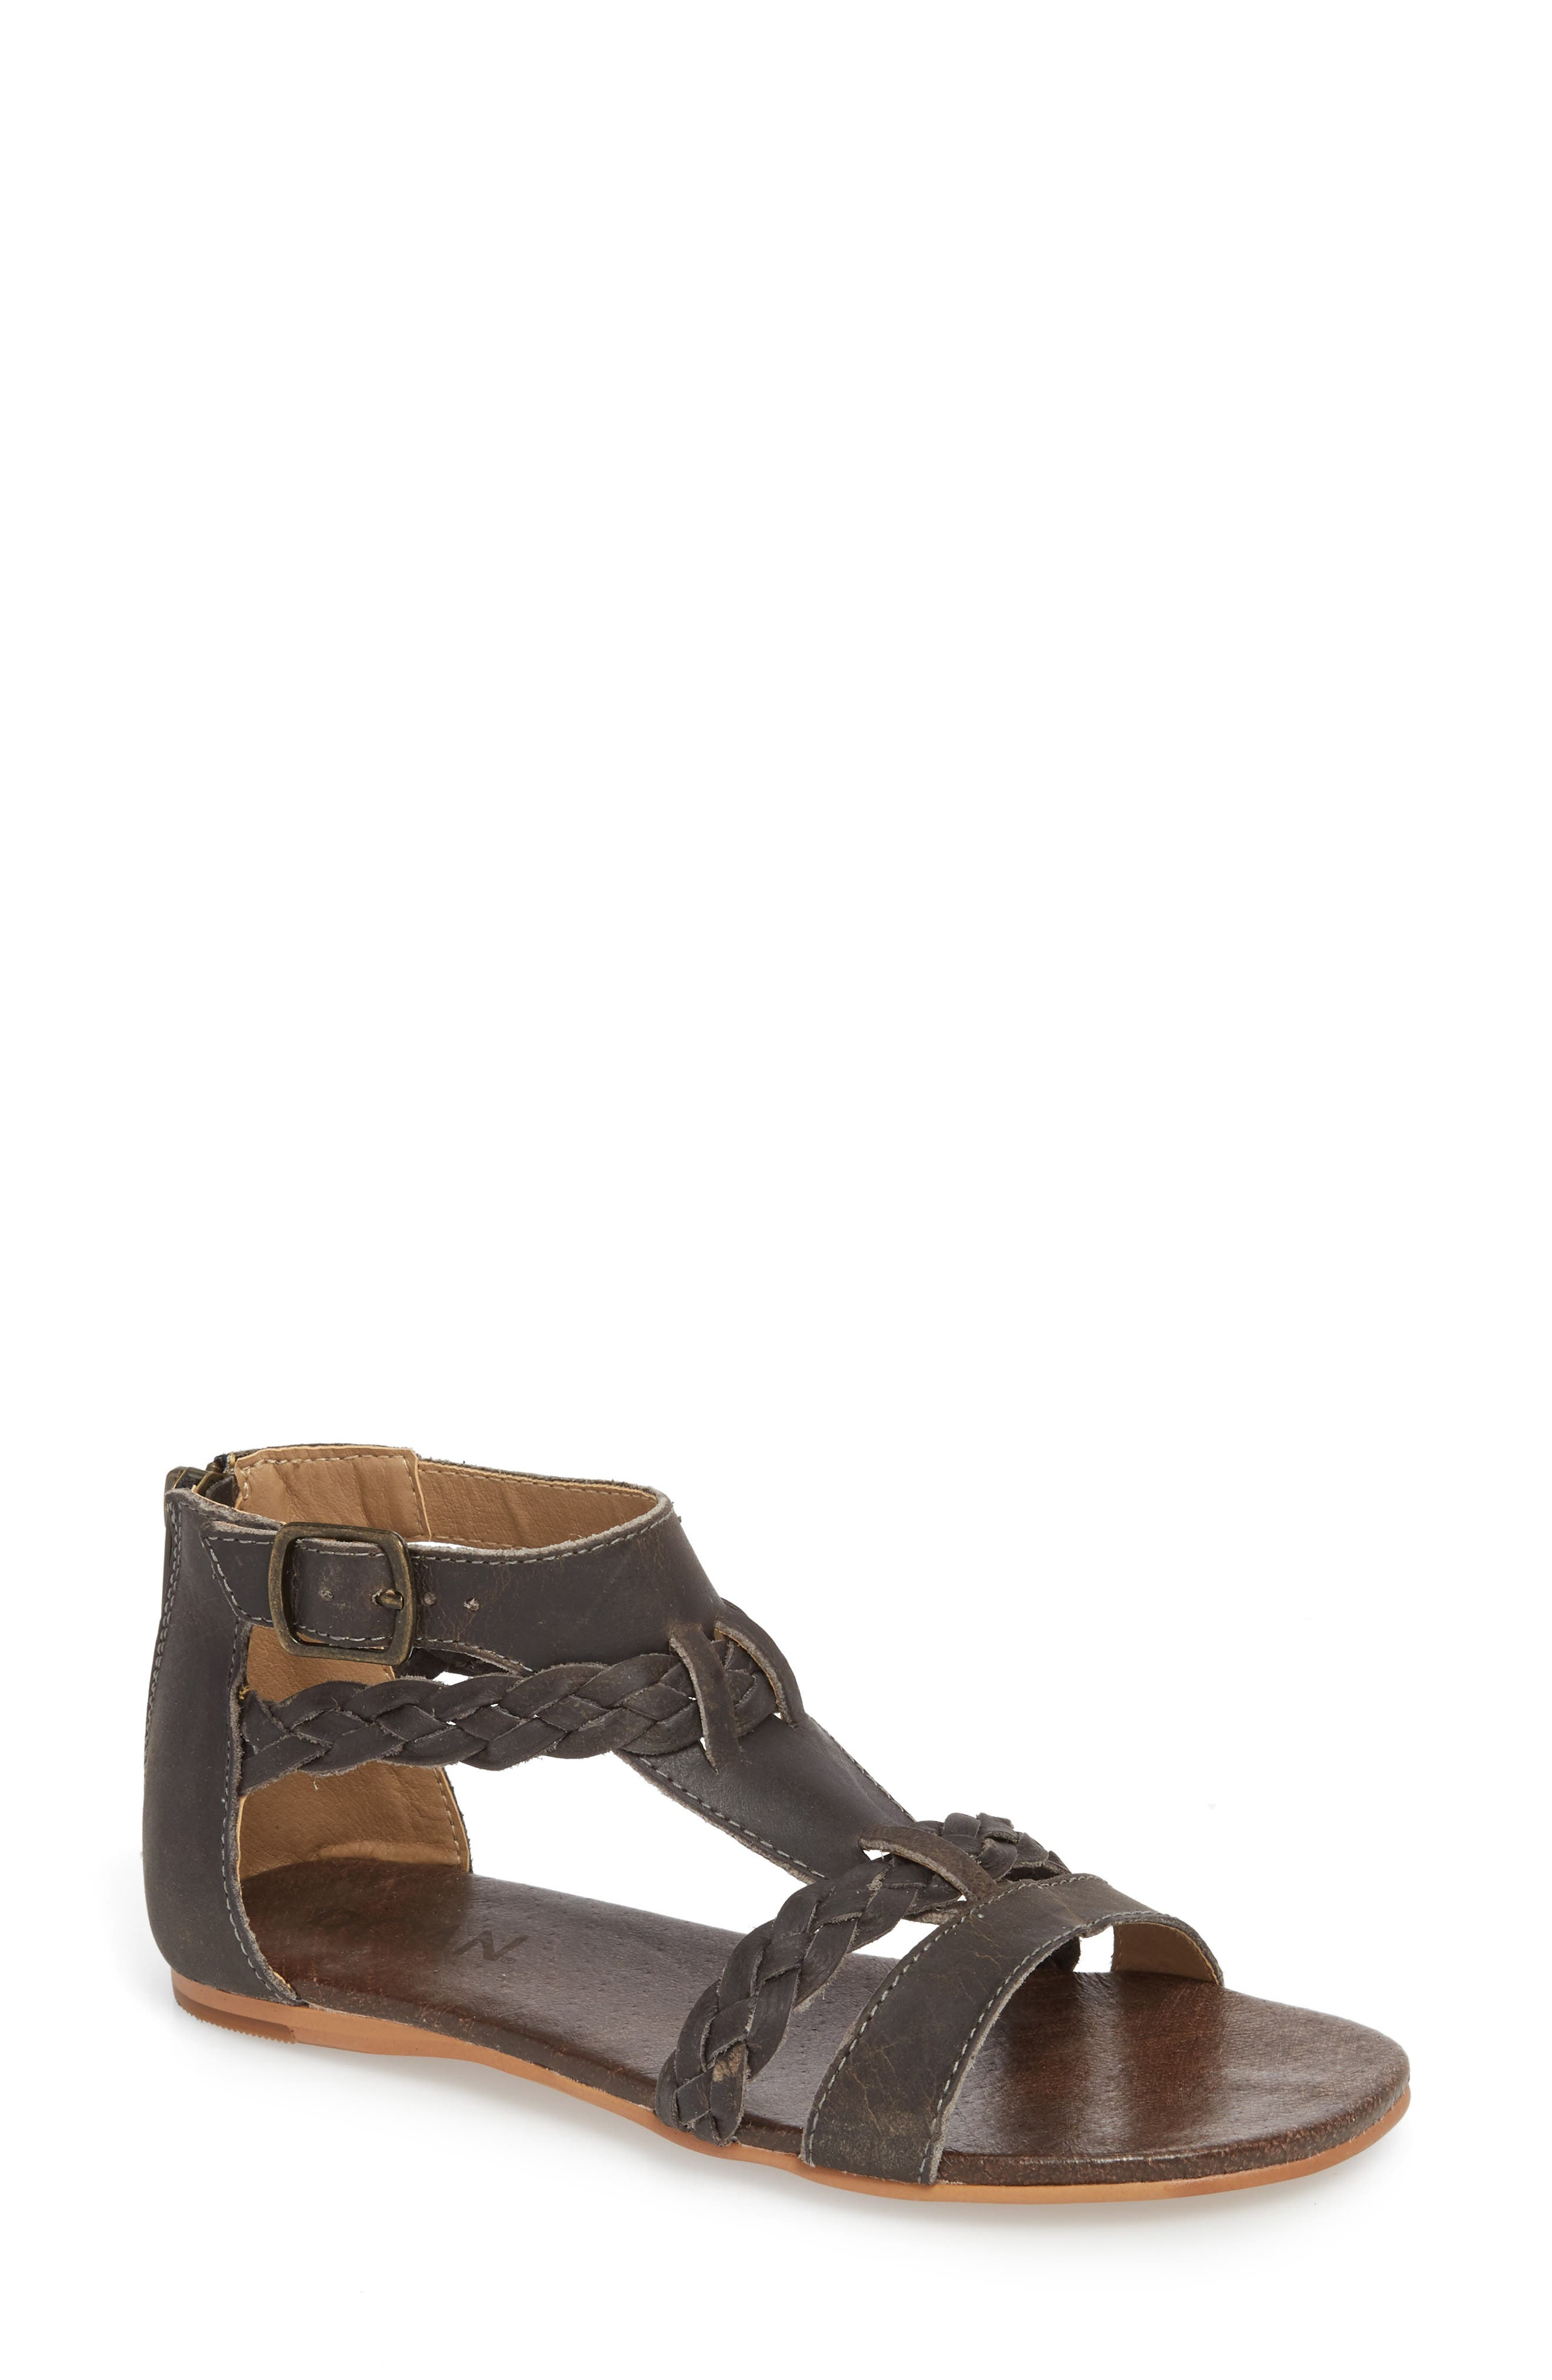 Posey Braided V-Strap Sandal,                             Main thumbnail 1, color,                             Sydney Black